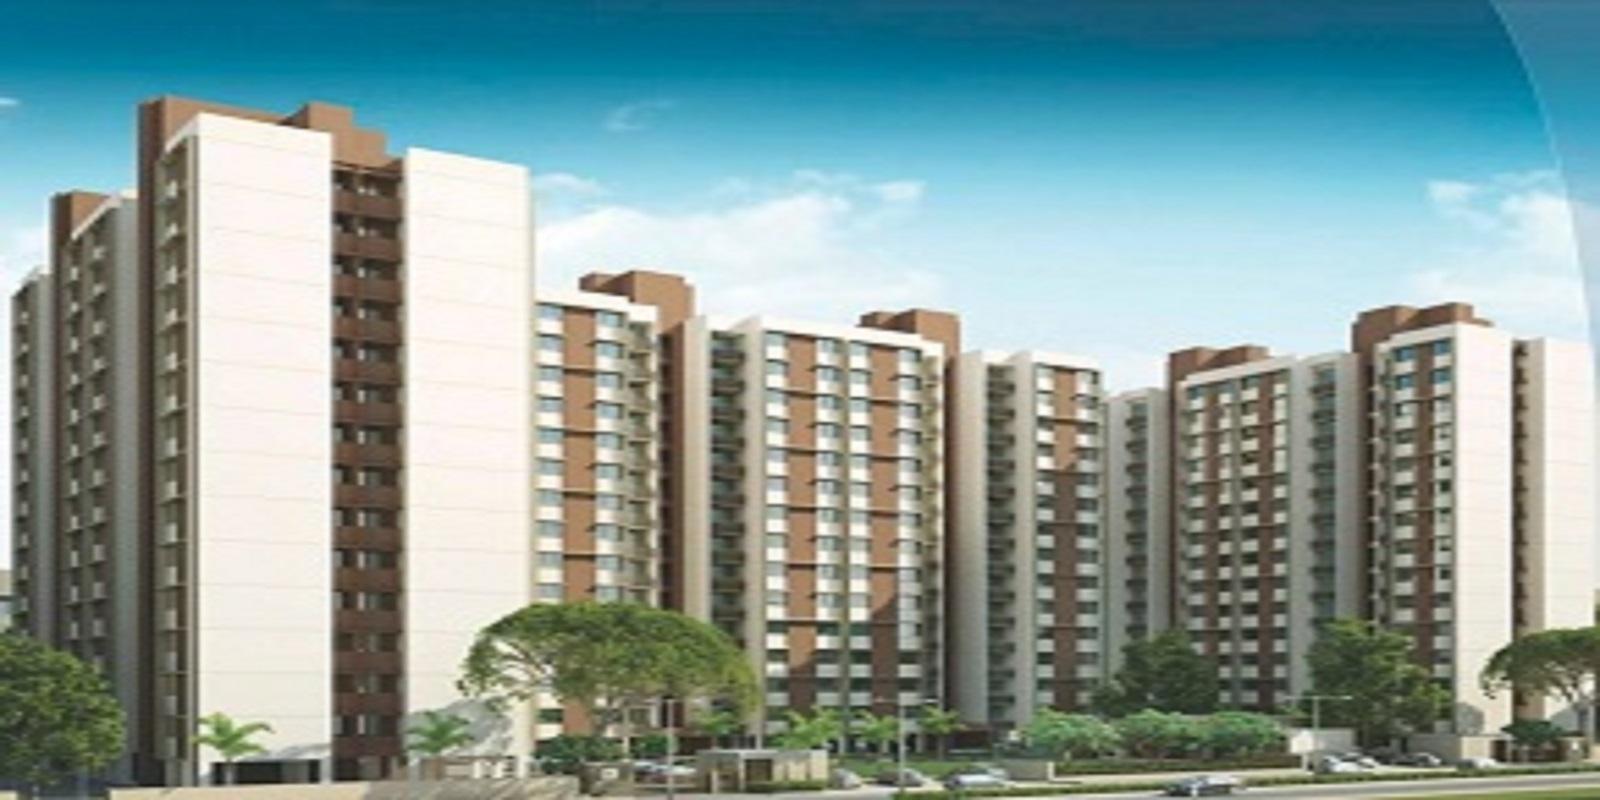 vishwanath maher homes project project large image1